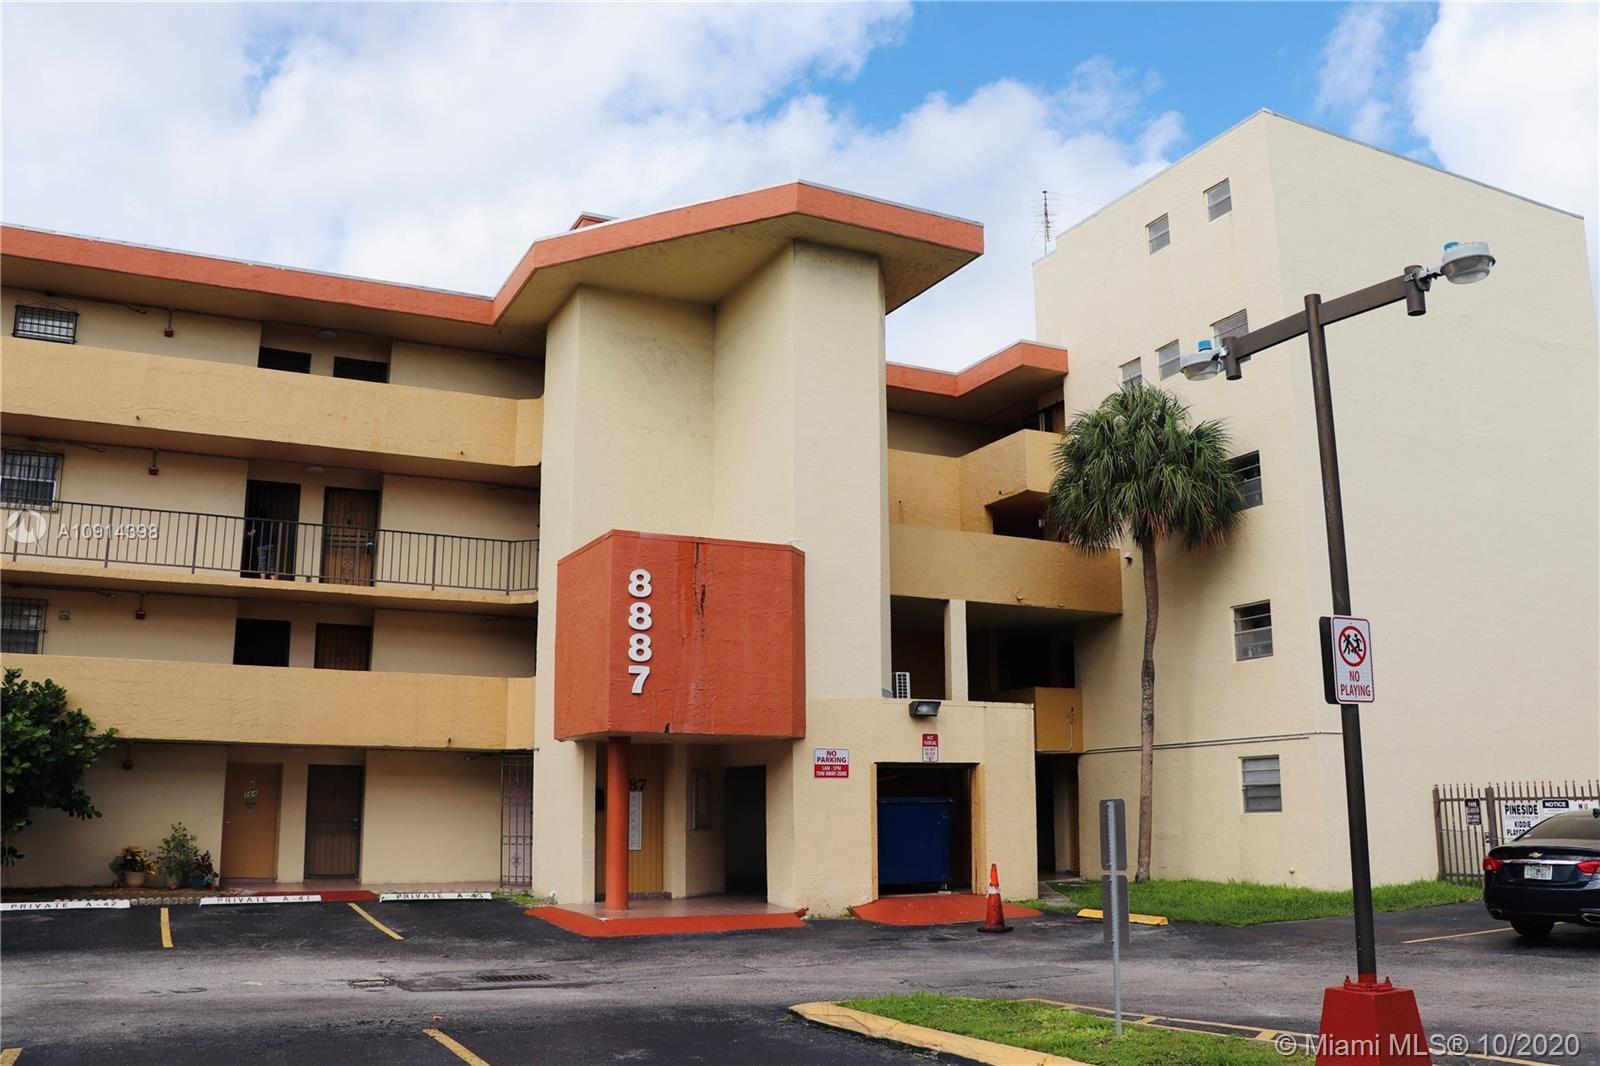 8887 Fontainebleau Blvd #306, Miami, FL 33172 - #: A10914398